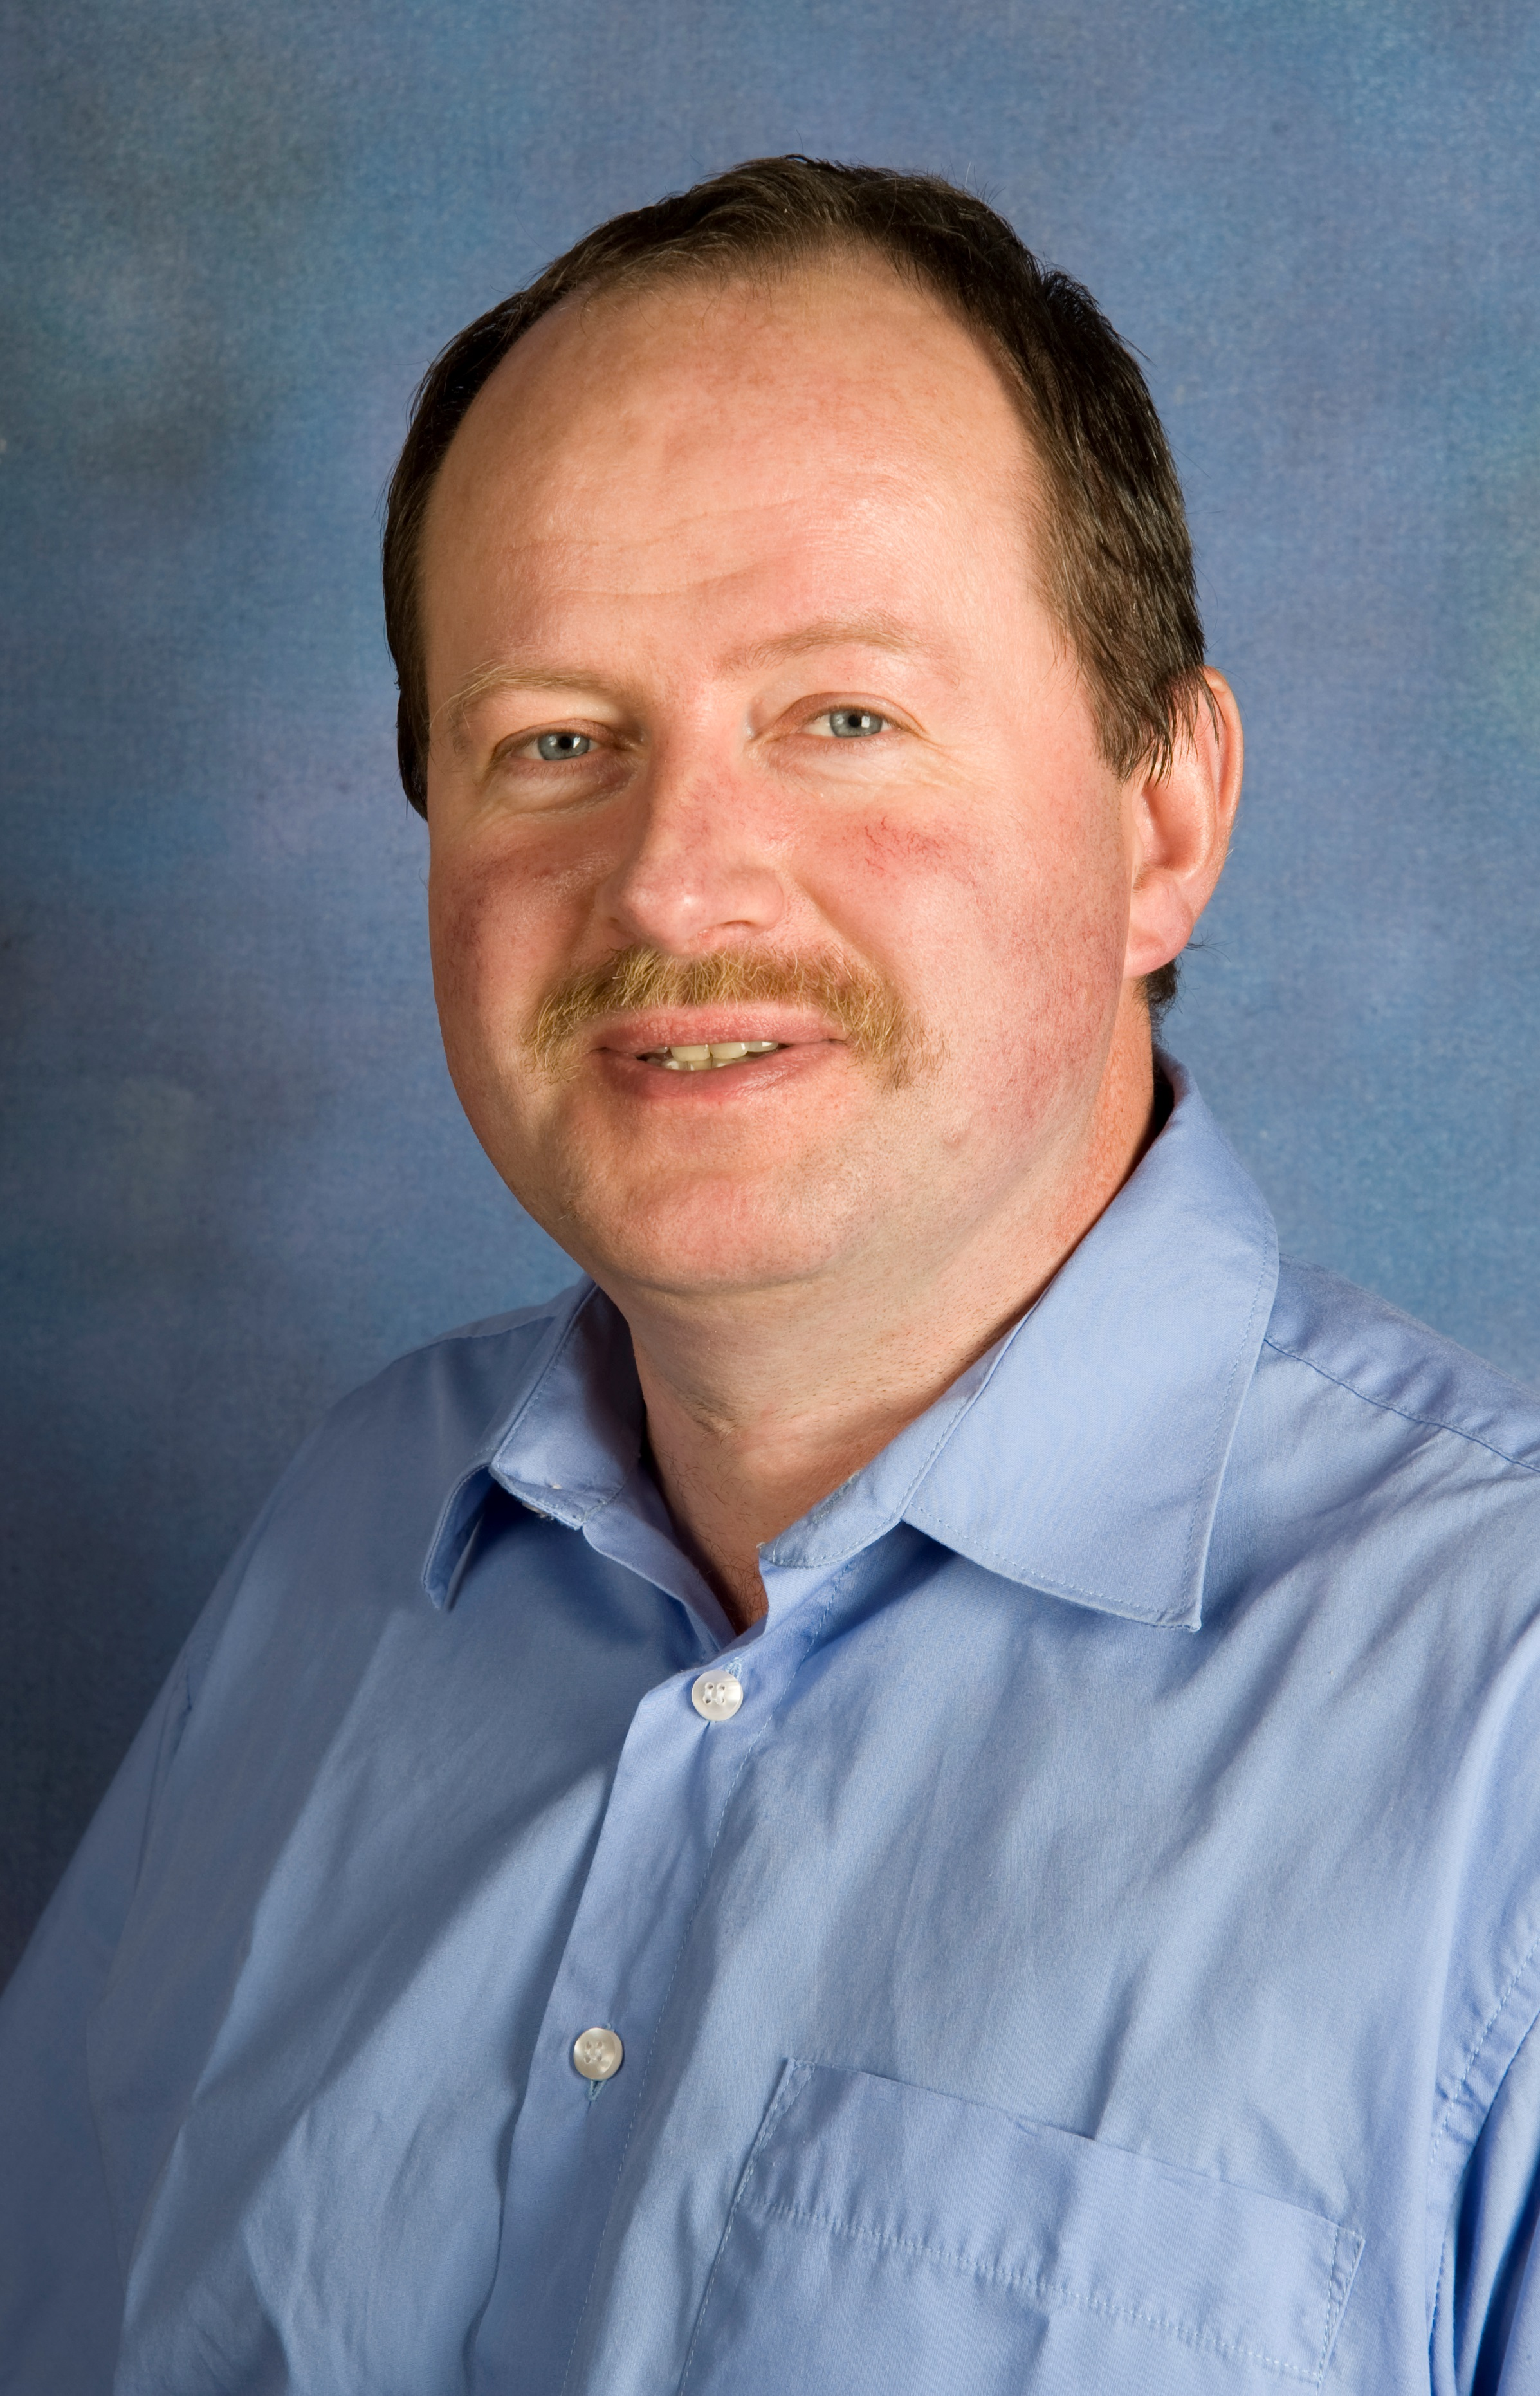 Landtagsdirektkandidat Jens Graf